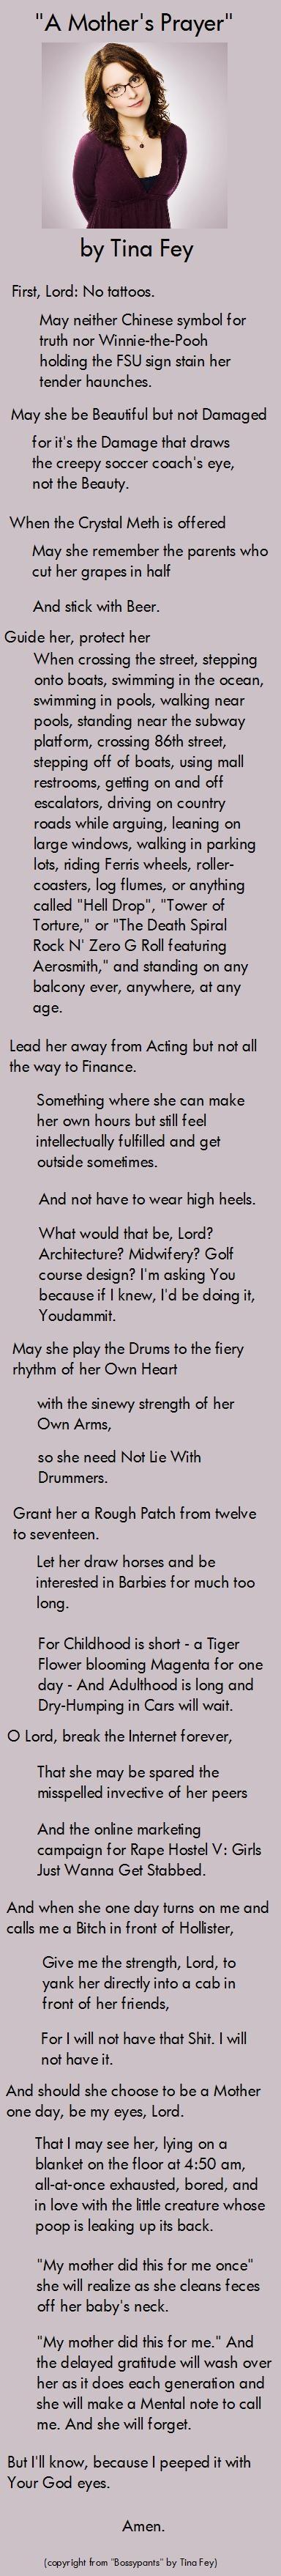 mothers-prayer-by-tina-fey-thumb